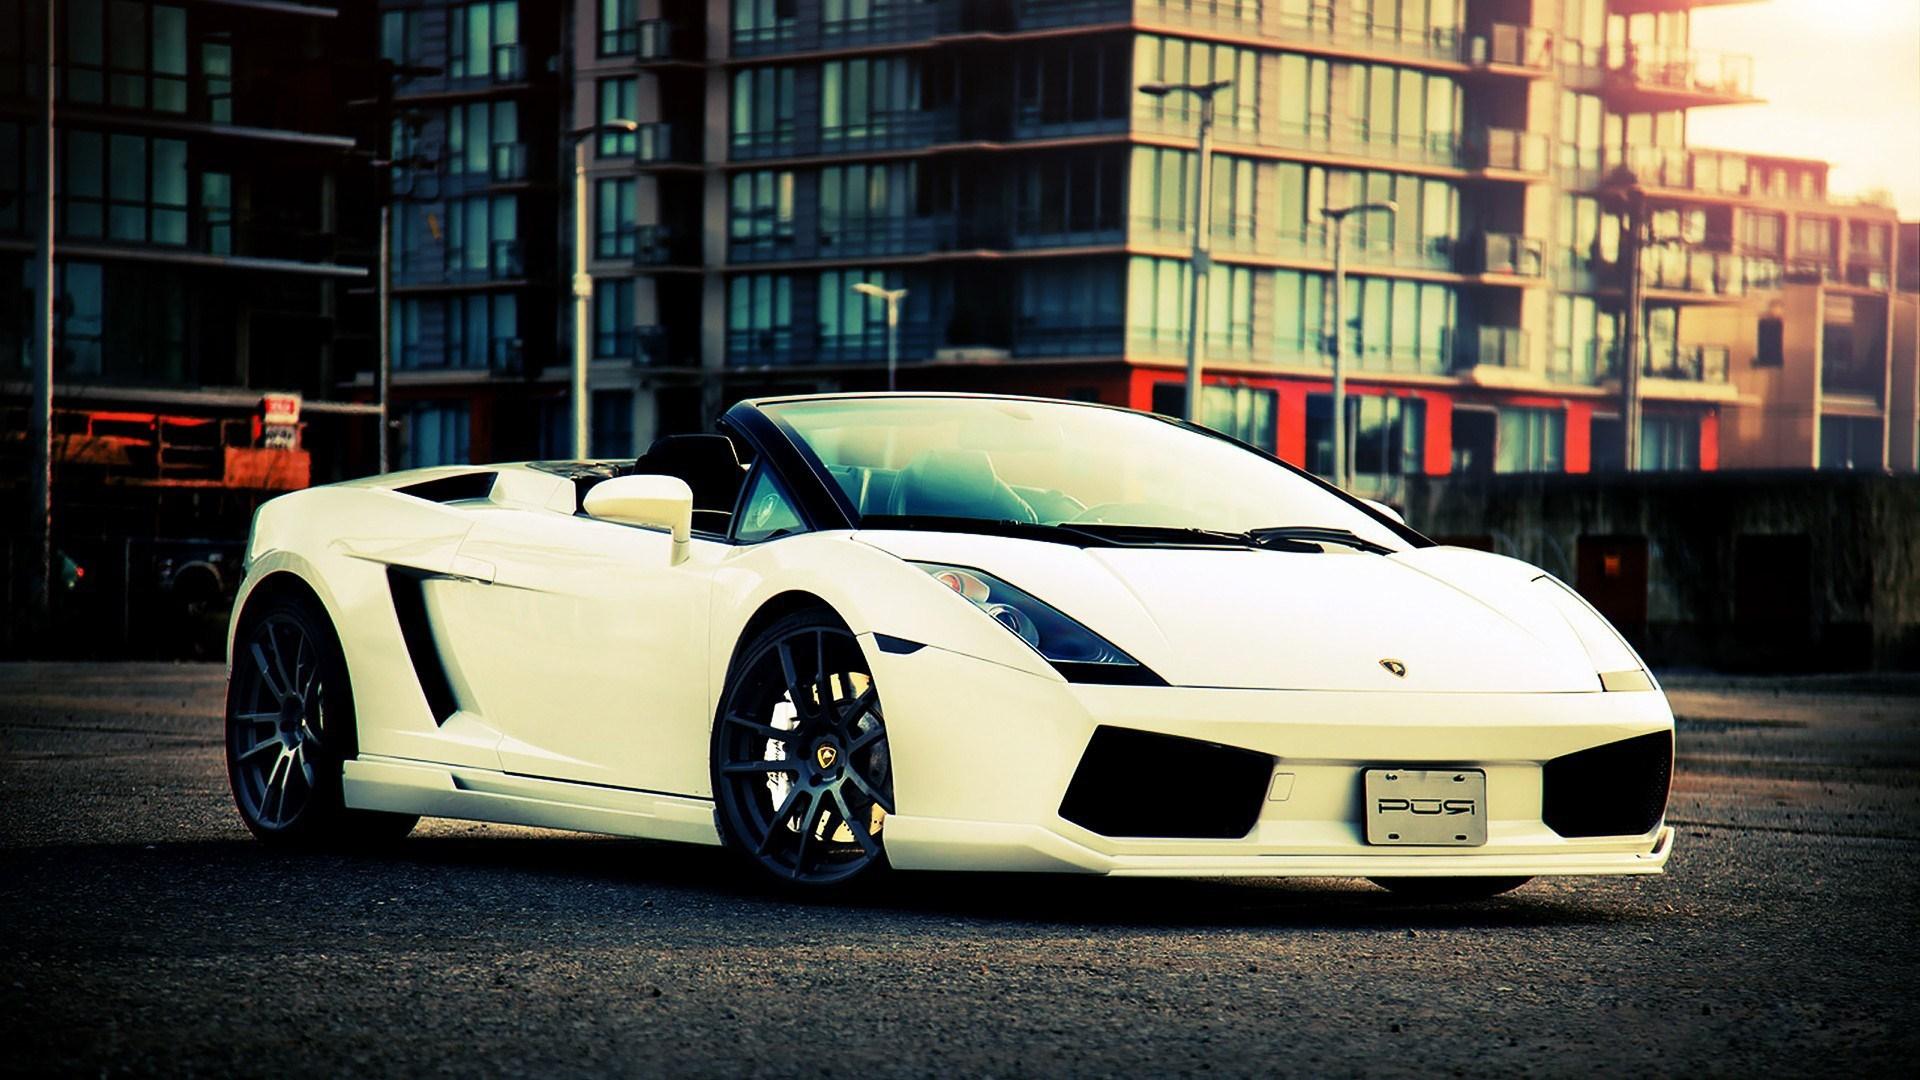 White Lamborghini Gallardo Spyder City Photo